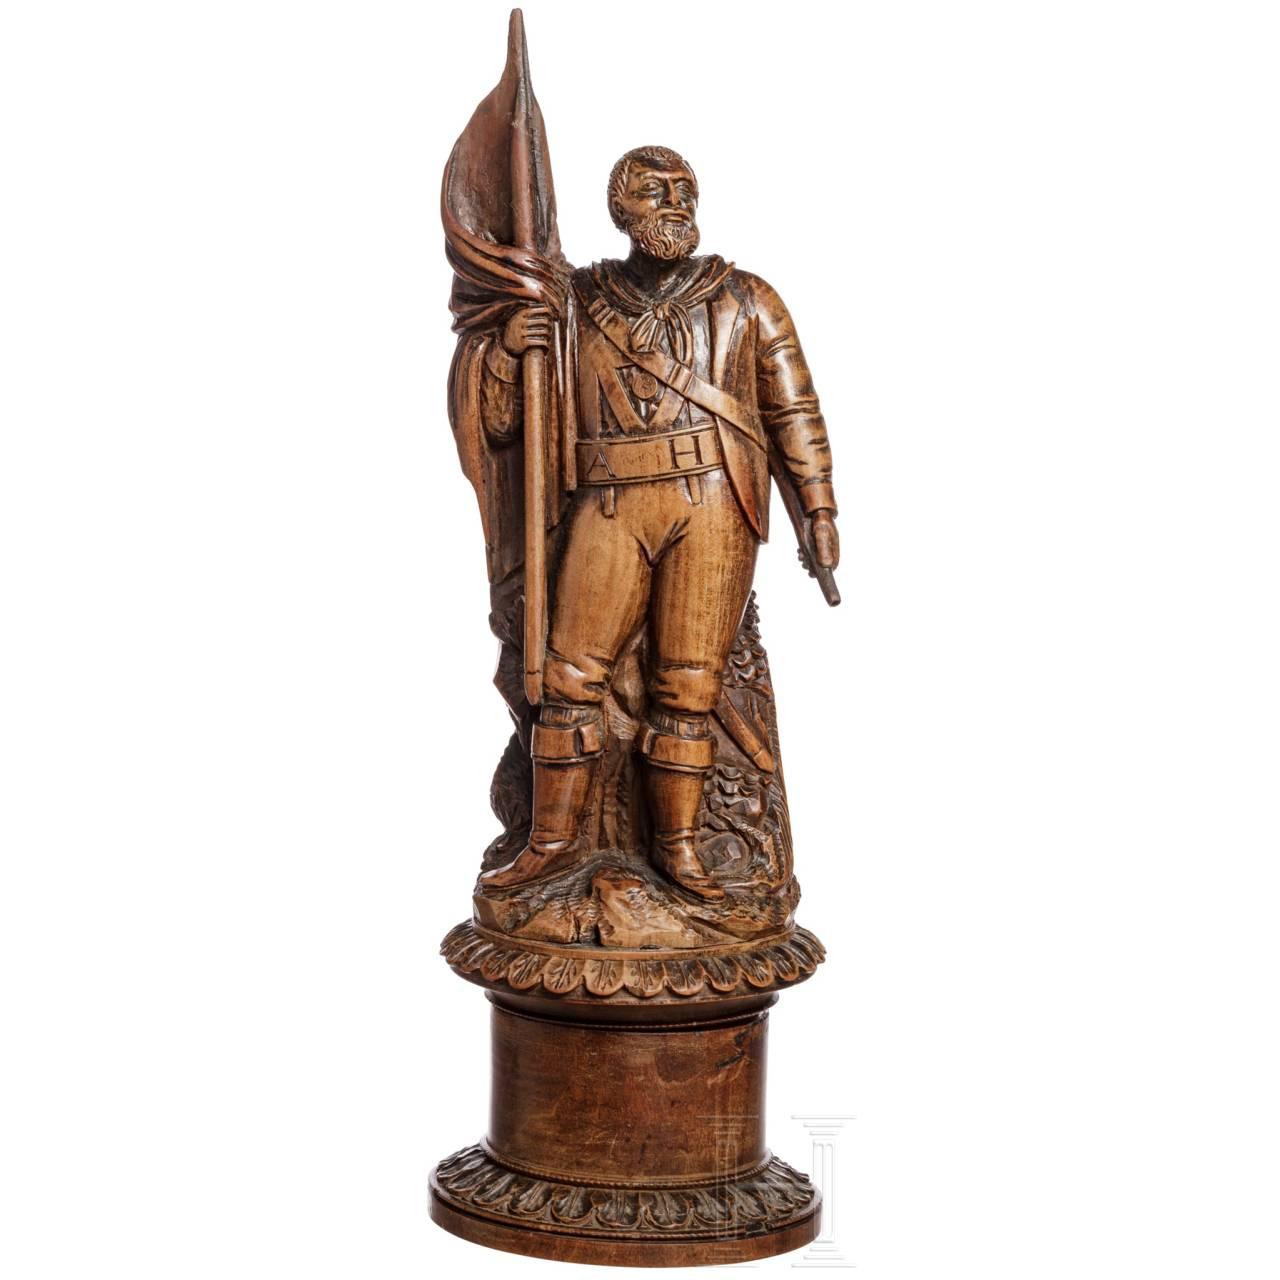 Holzdose mit der Figur Andreas Hofers, frühes 19. Jhdt.